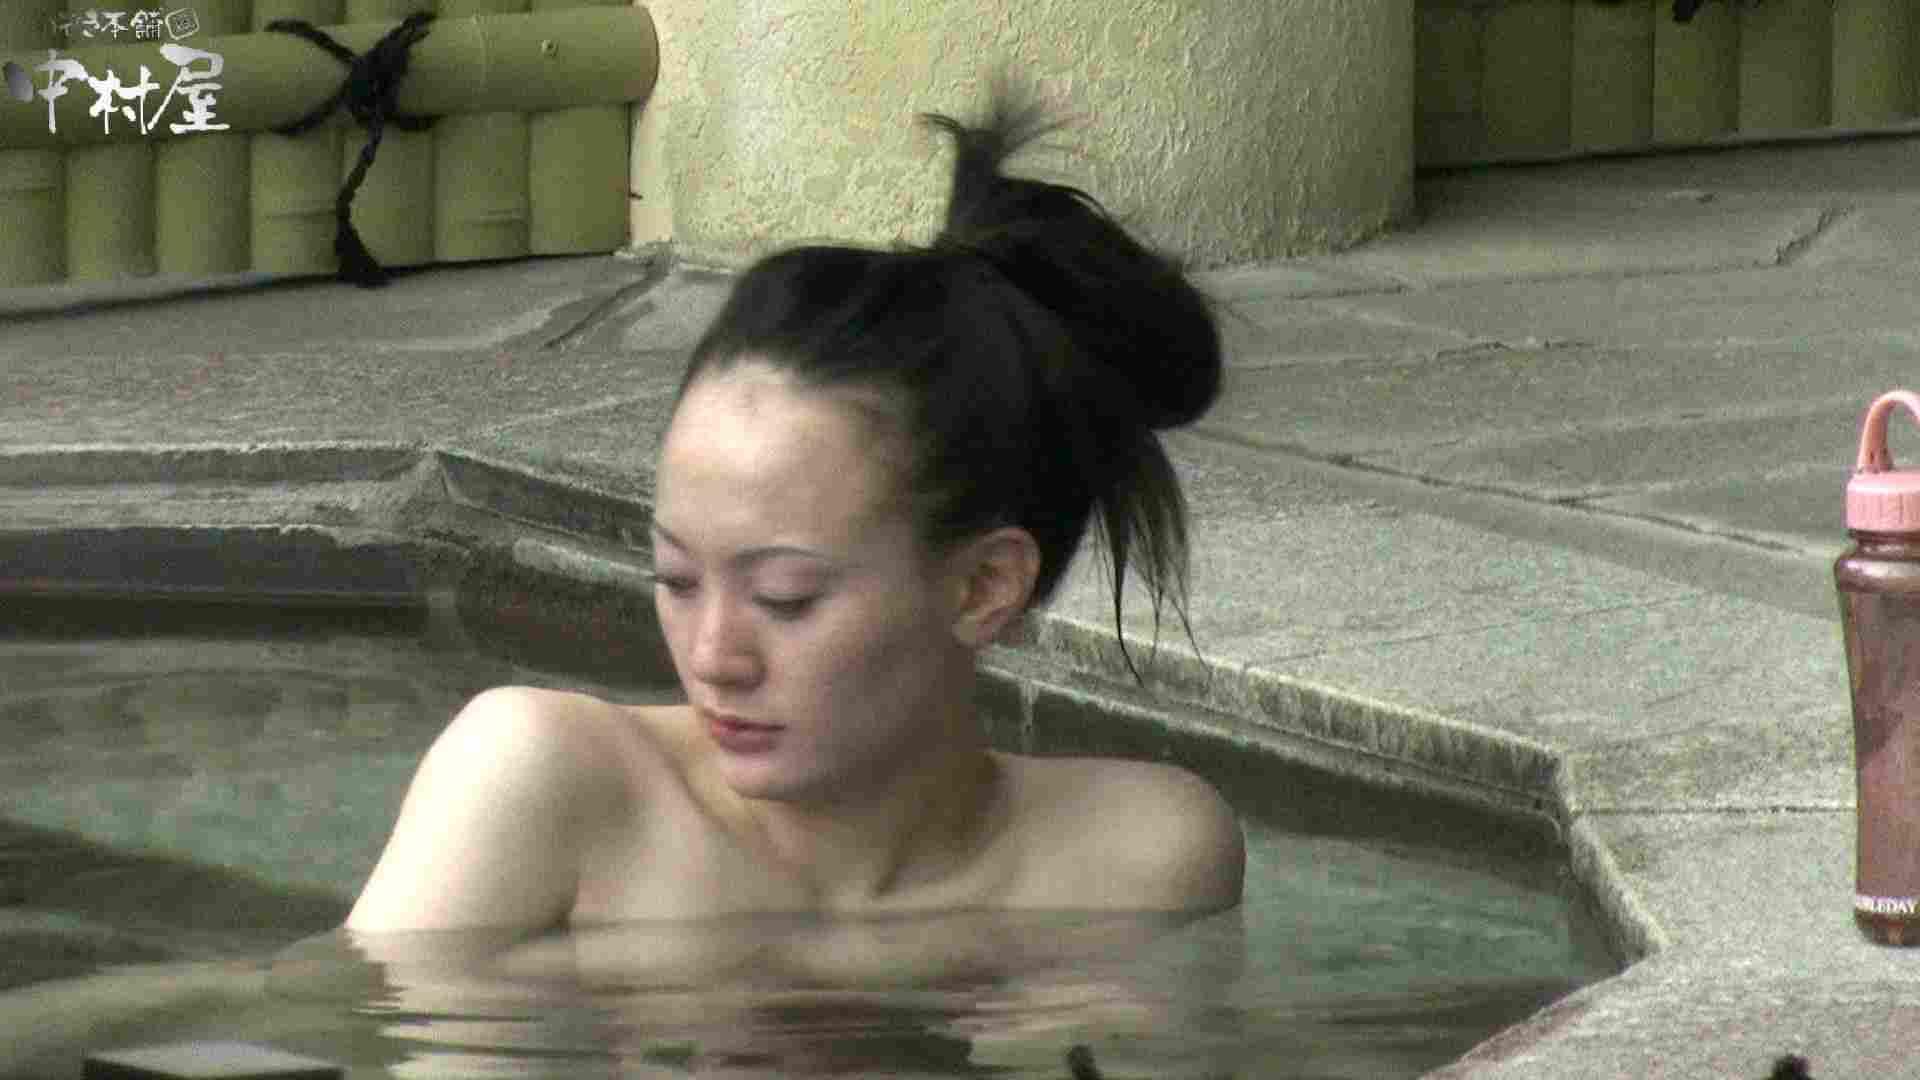 Aquaな露天風呂Vol.900 OLのエロ生活 すけべAV動画紹介 88連発 47